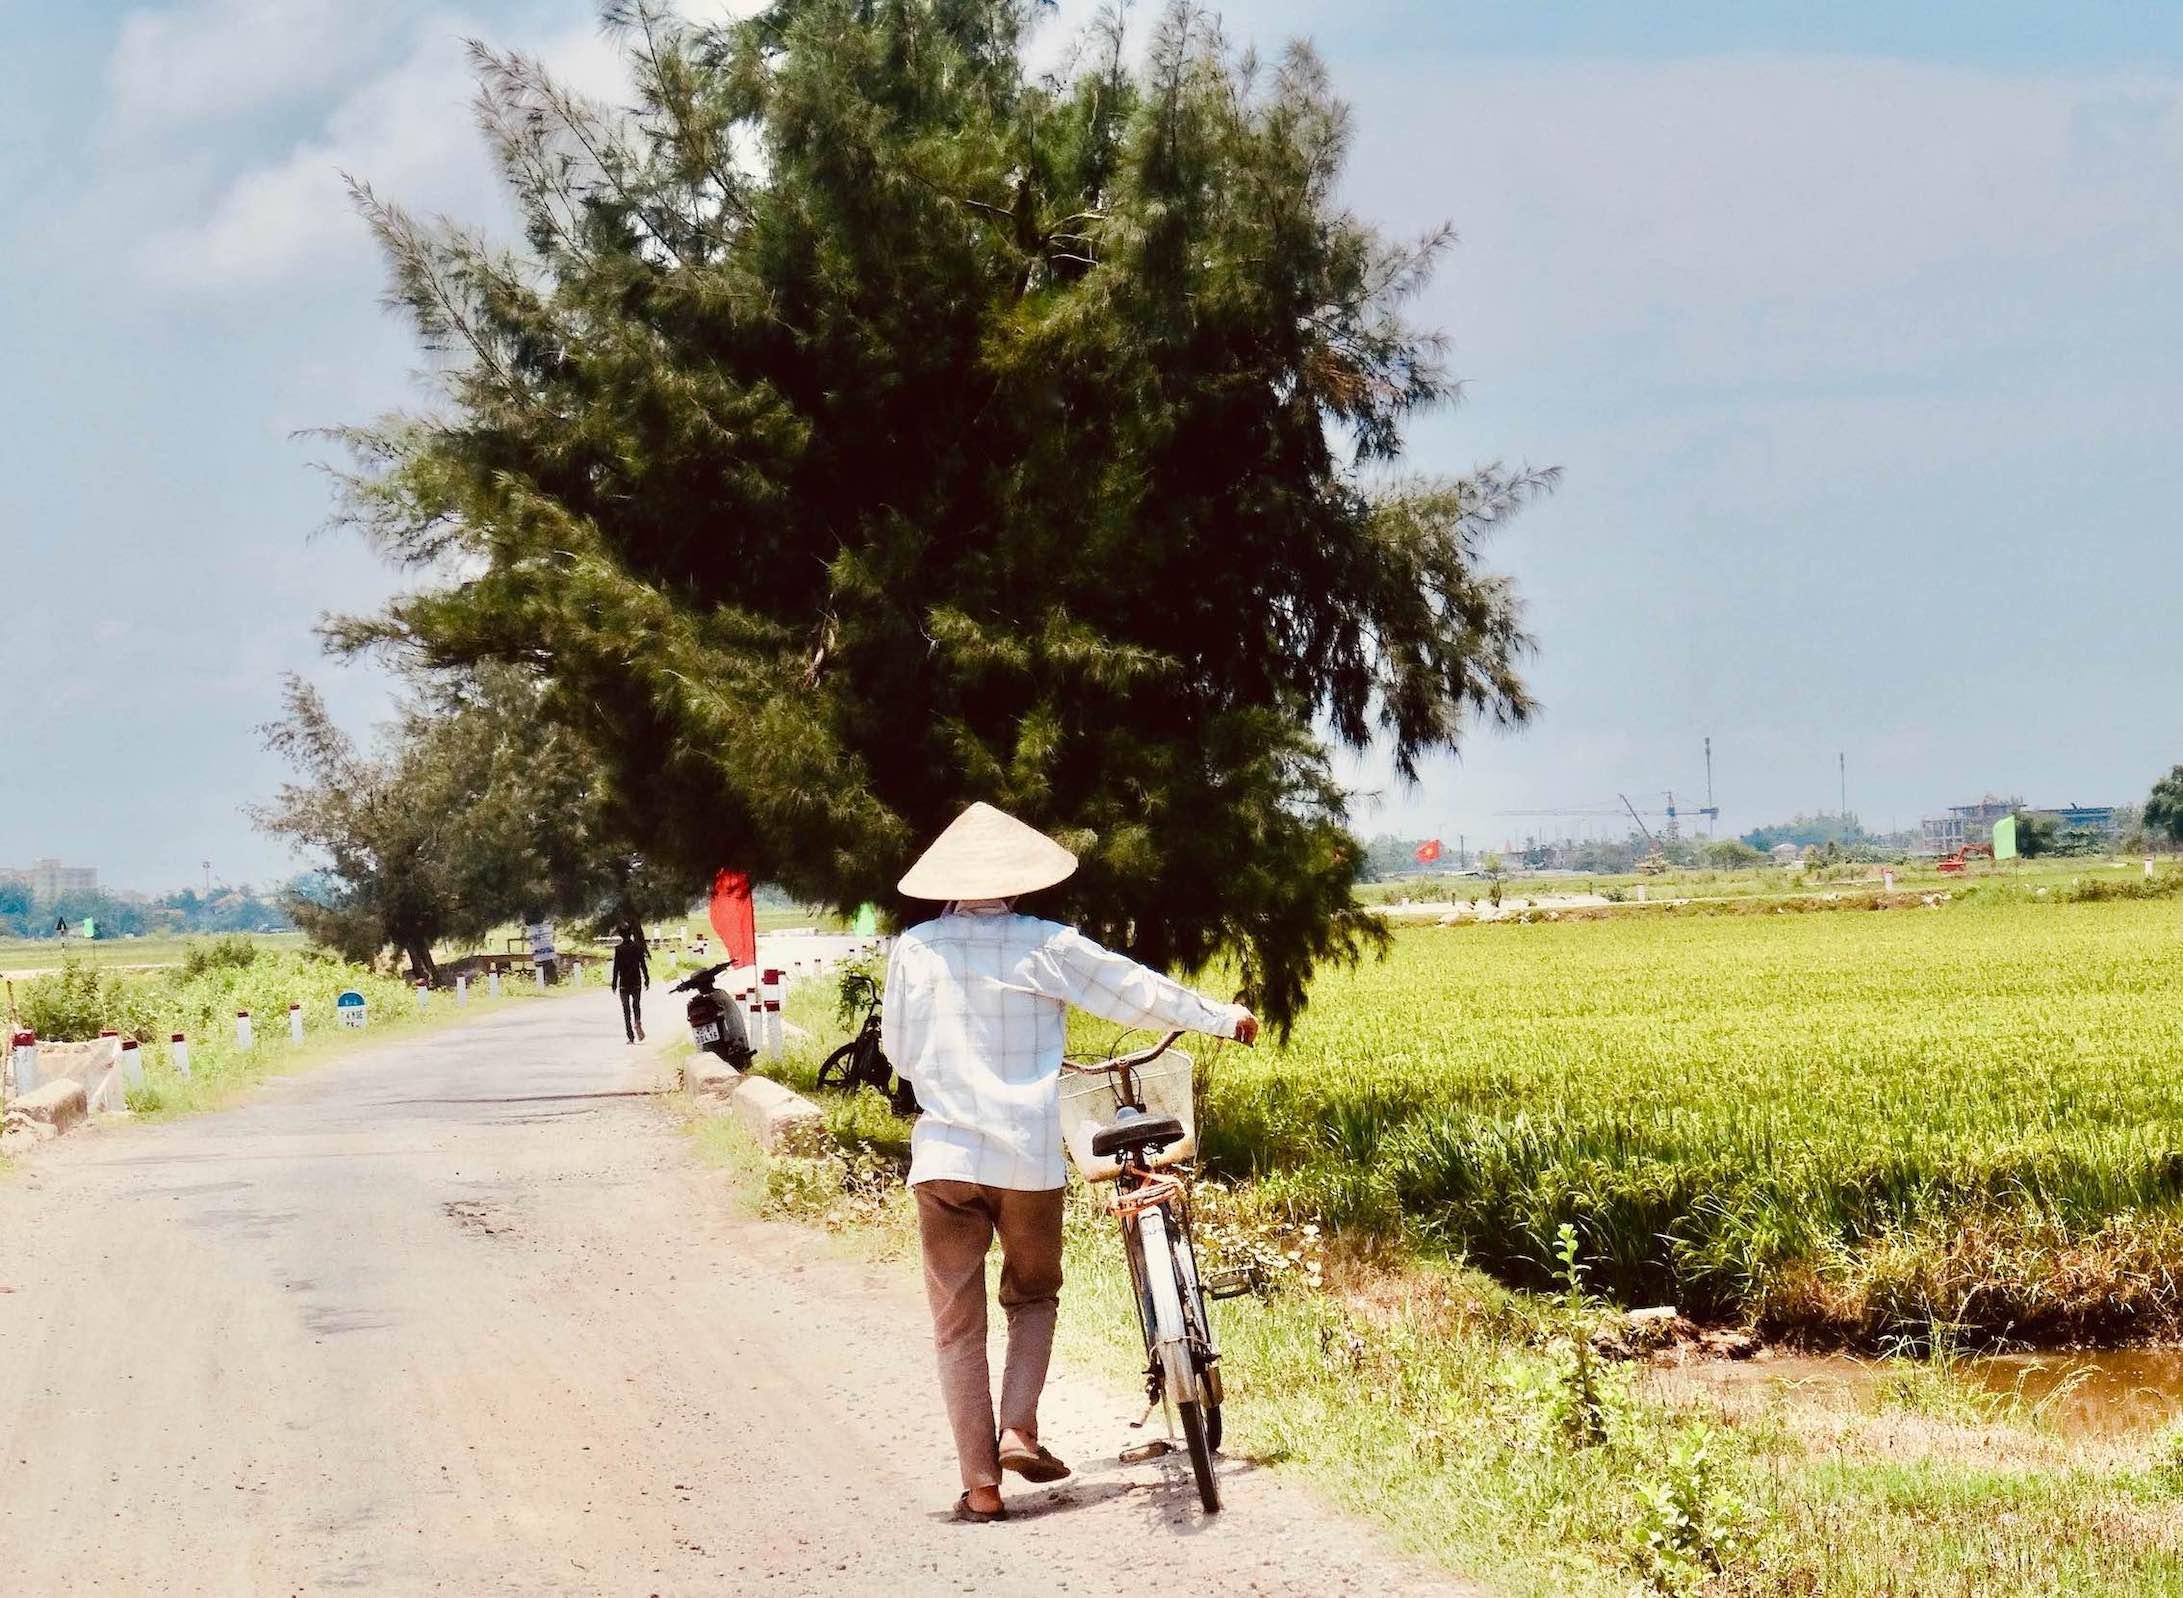 Man and bicycle Hue Vietnam.